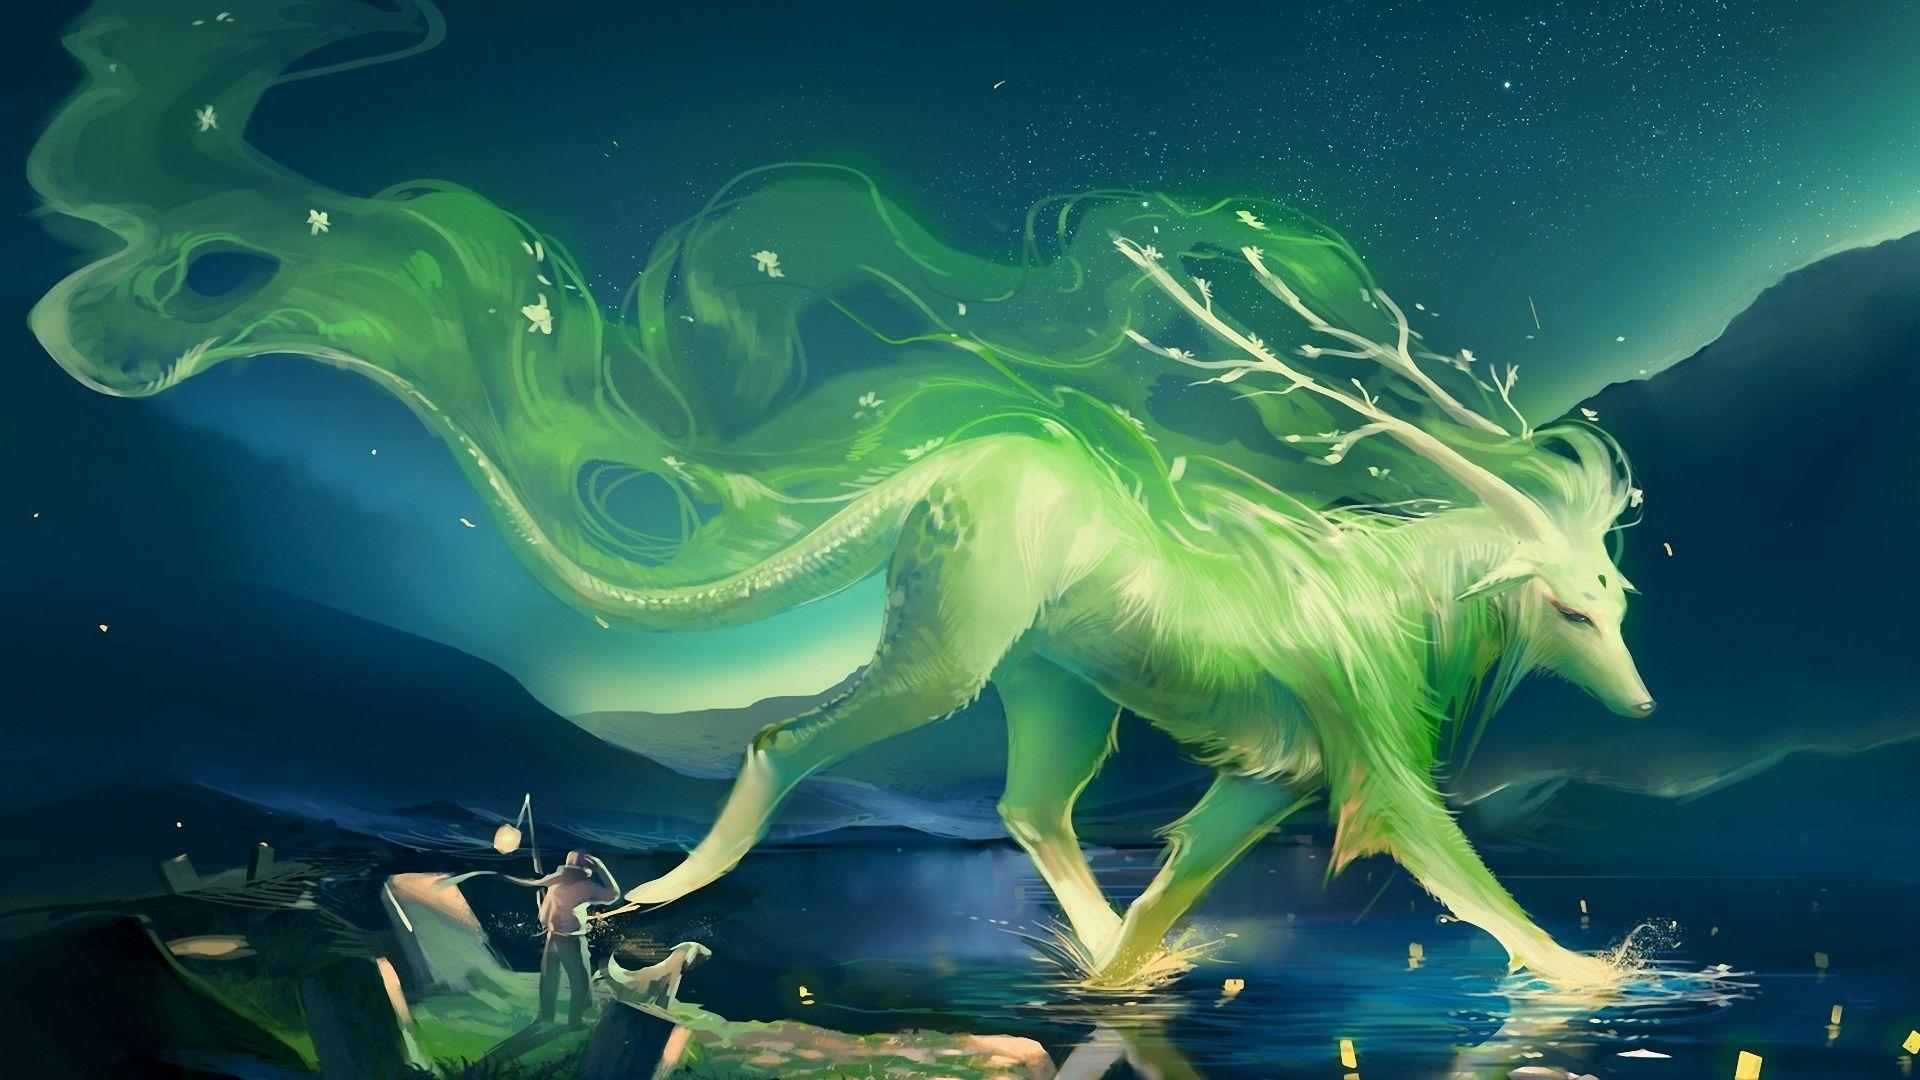 Elemental Animal Wallpapers - Top Free Elemental Animal Backgrounds